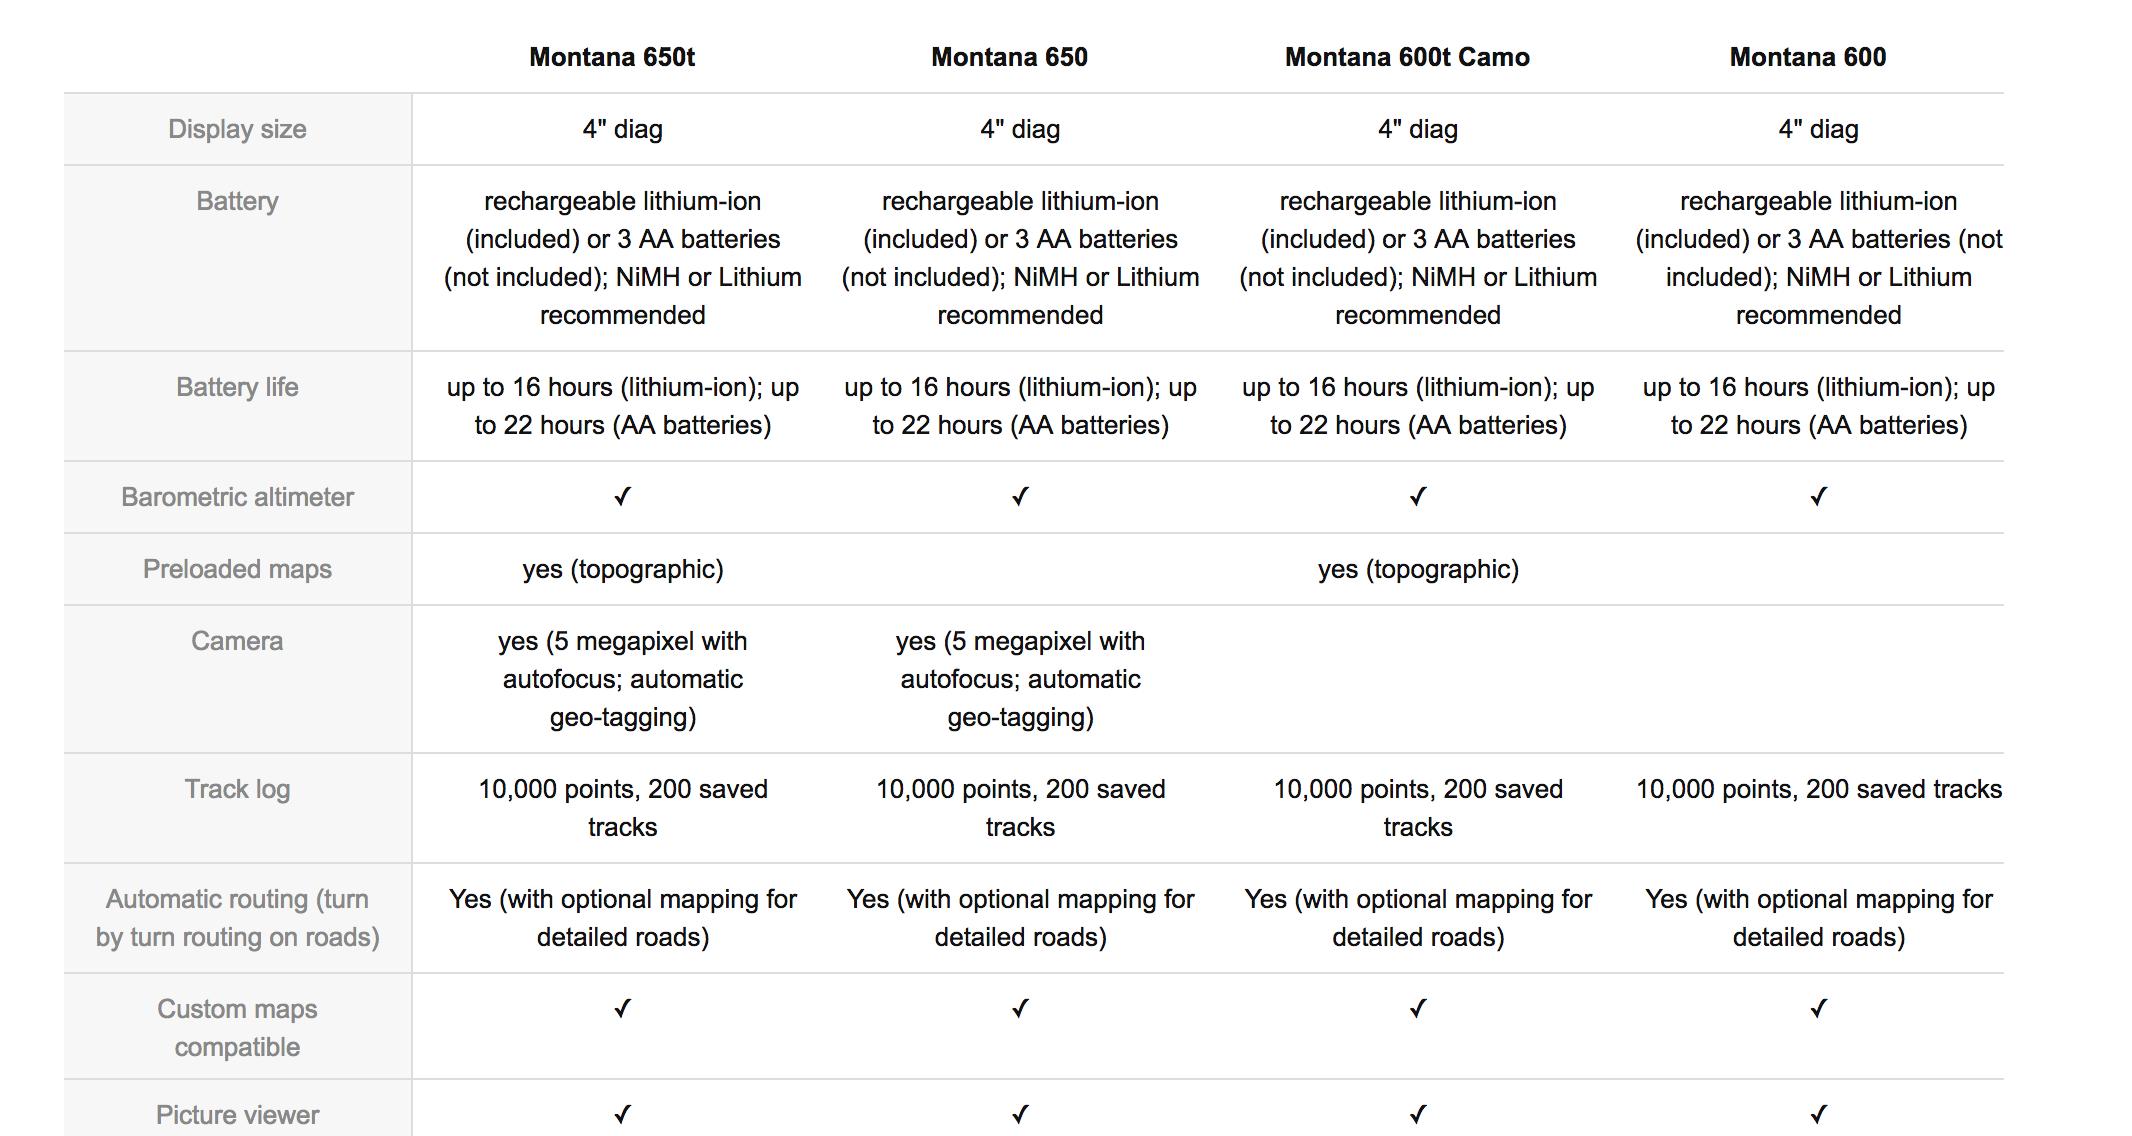 garmin montana 600 vs 650